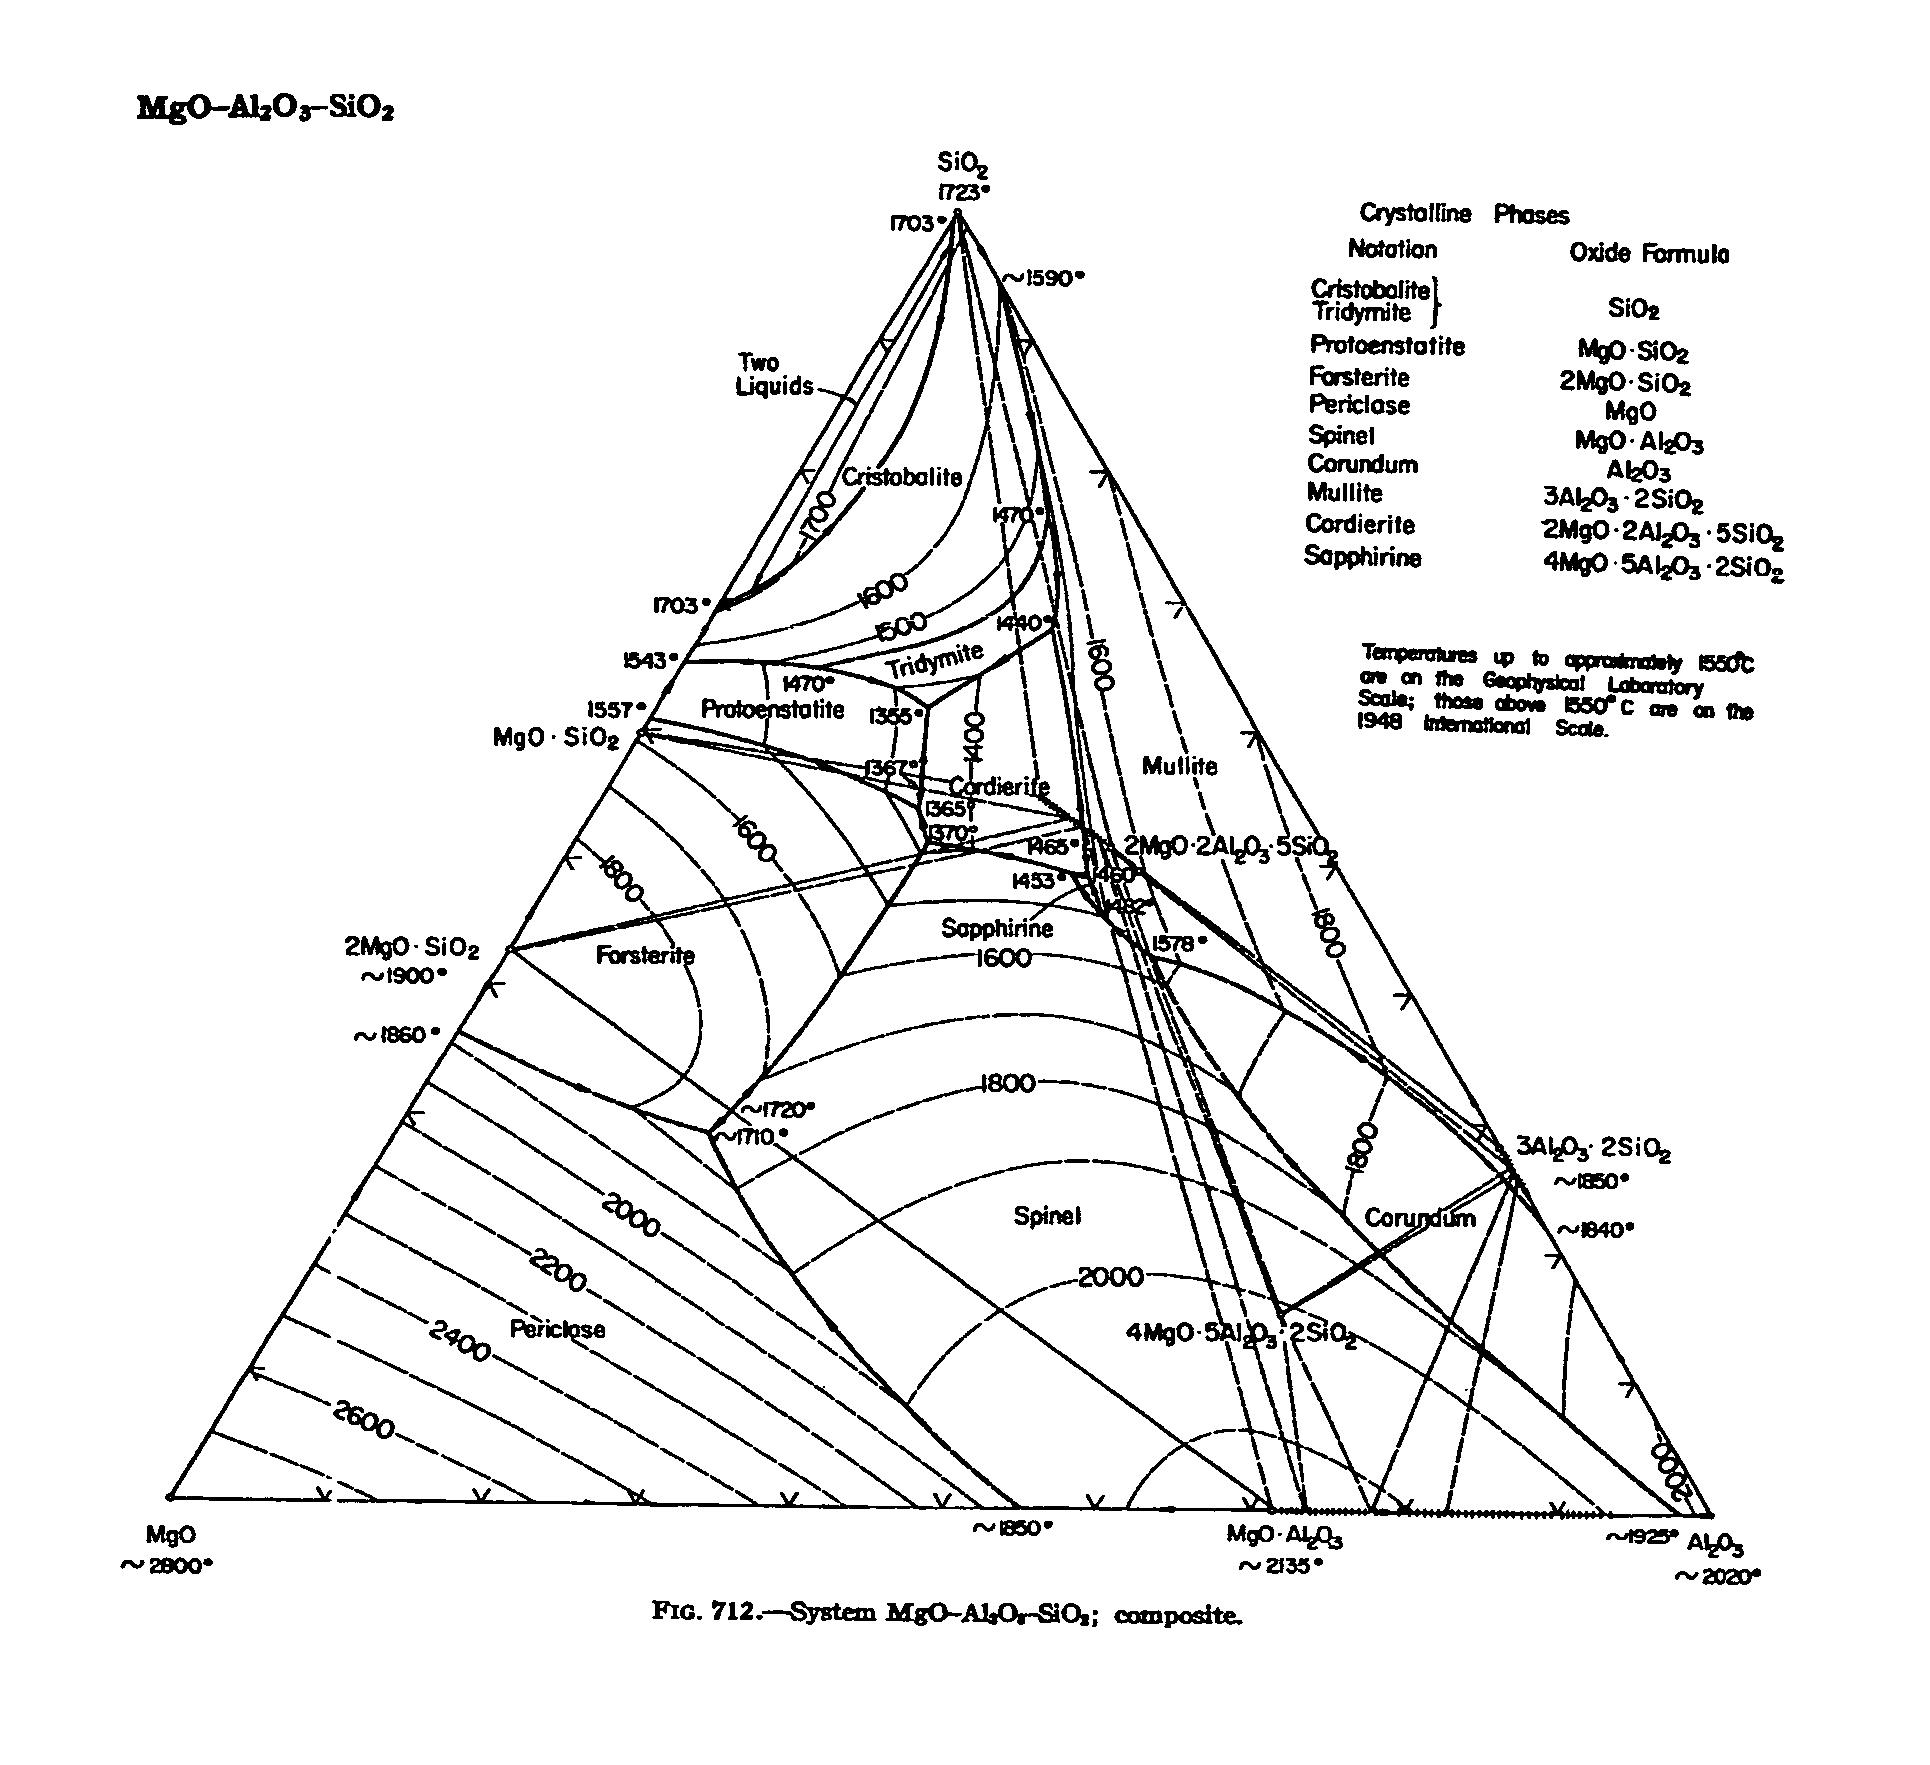 explain iron carbon equilibrium diagram of dune formation oxide phase related keywords